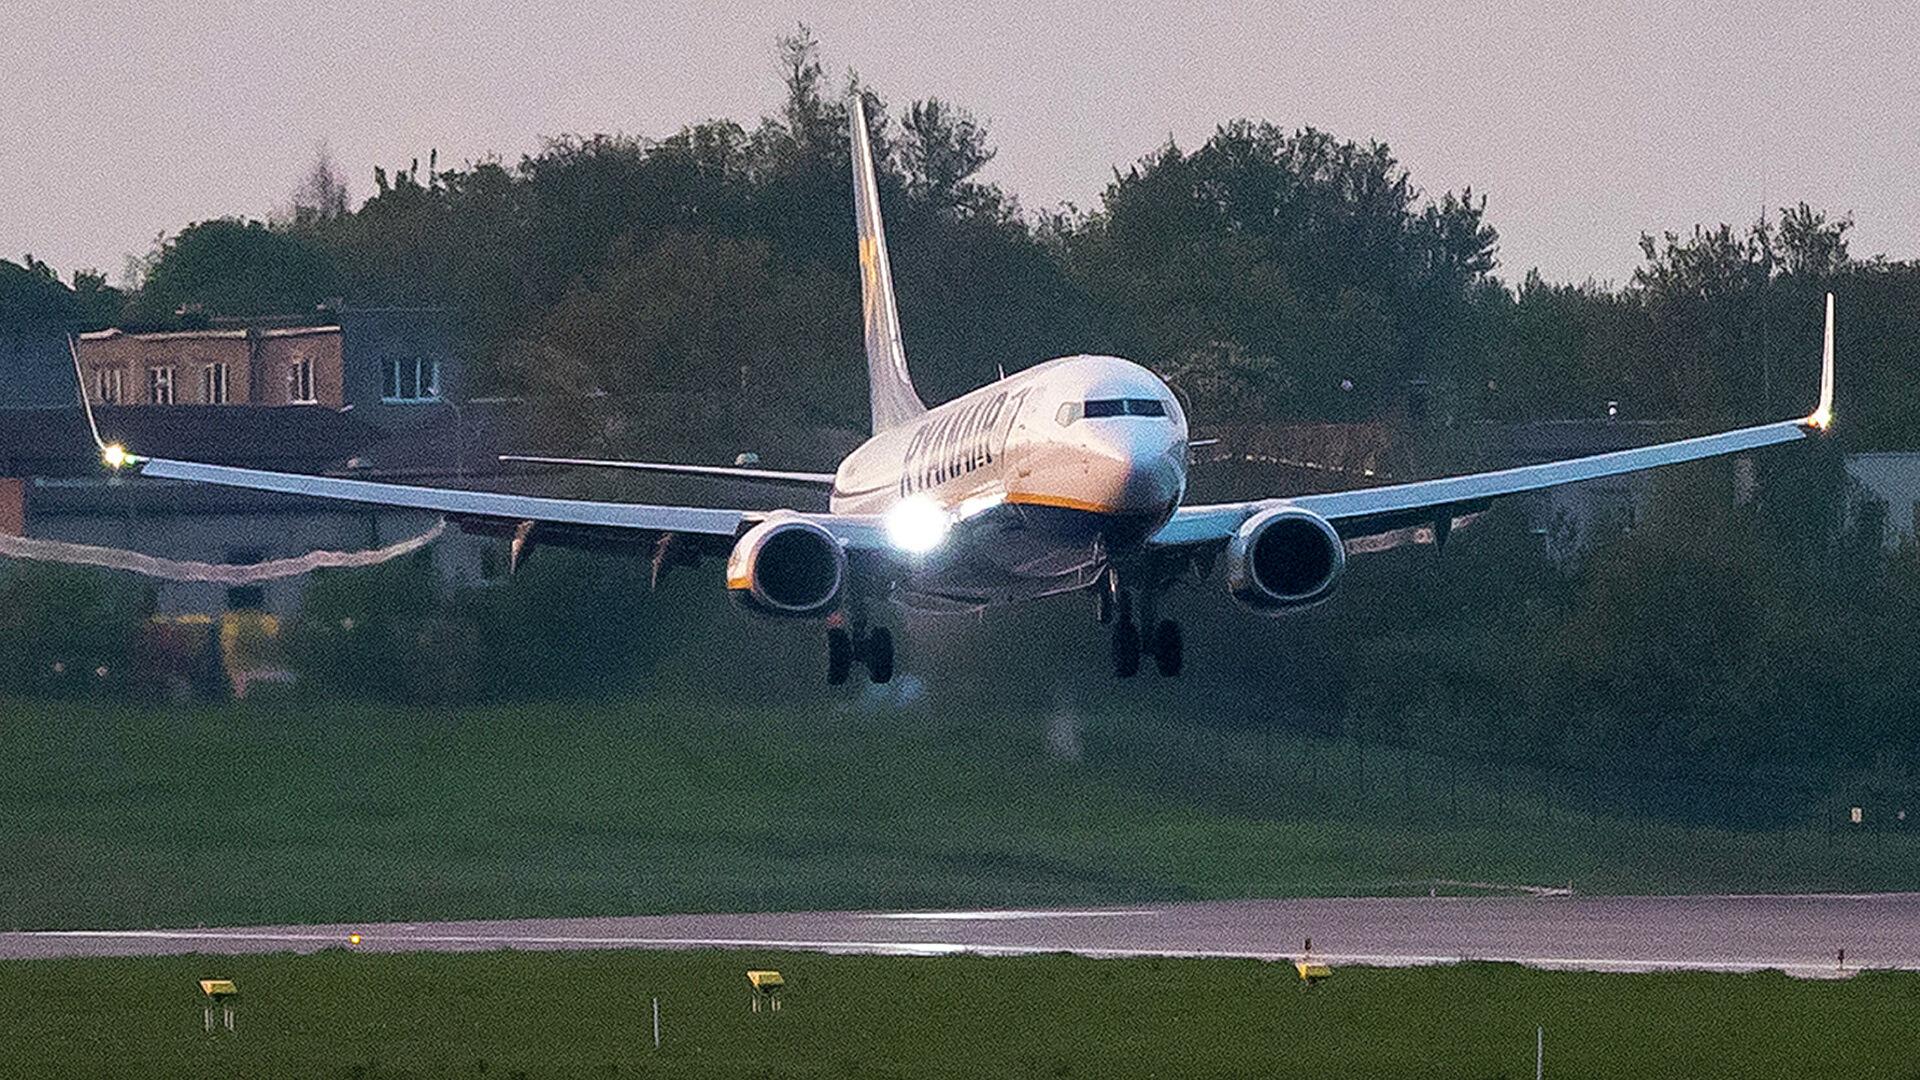 ICAO возглавит расследование инцидента с самолетом Ryanair в Минске